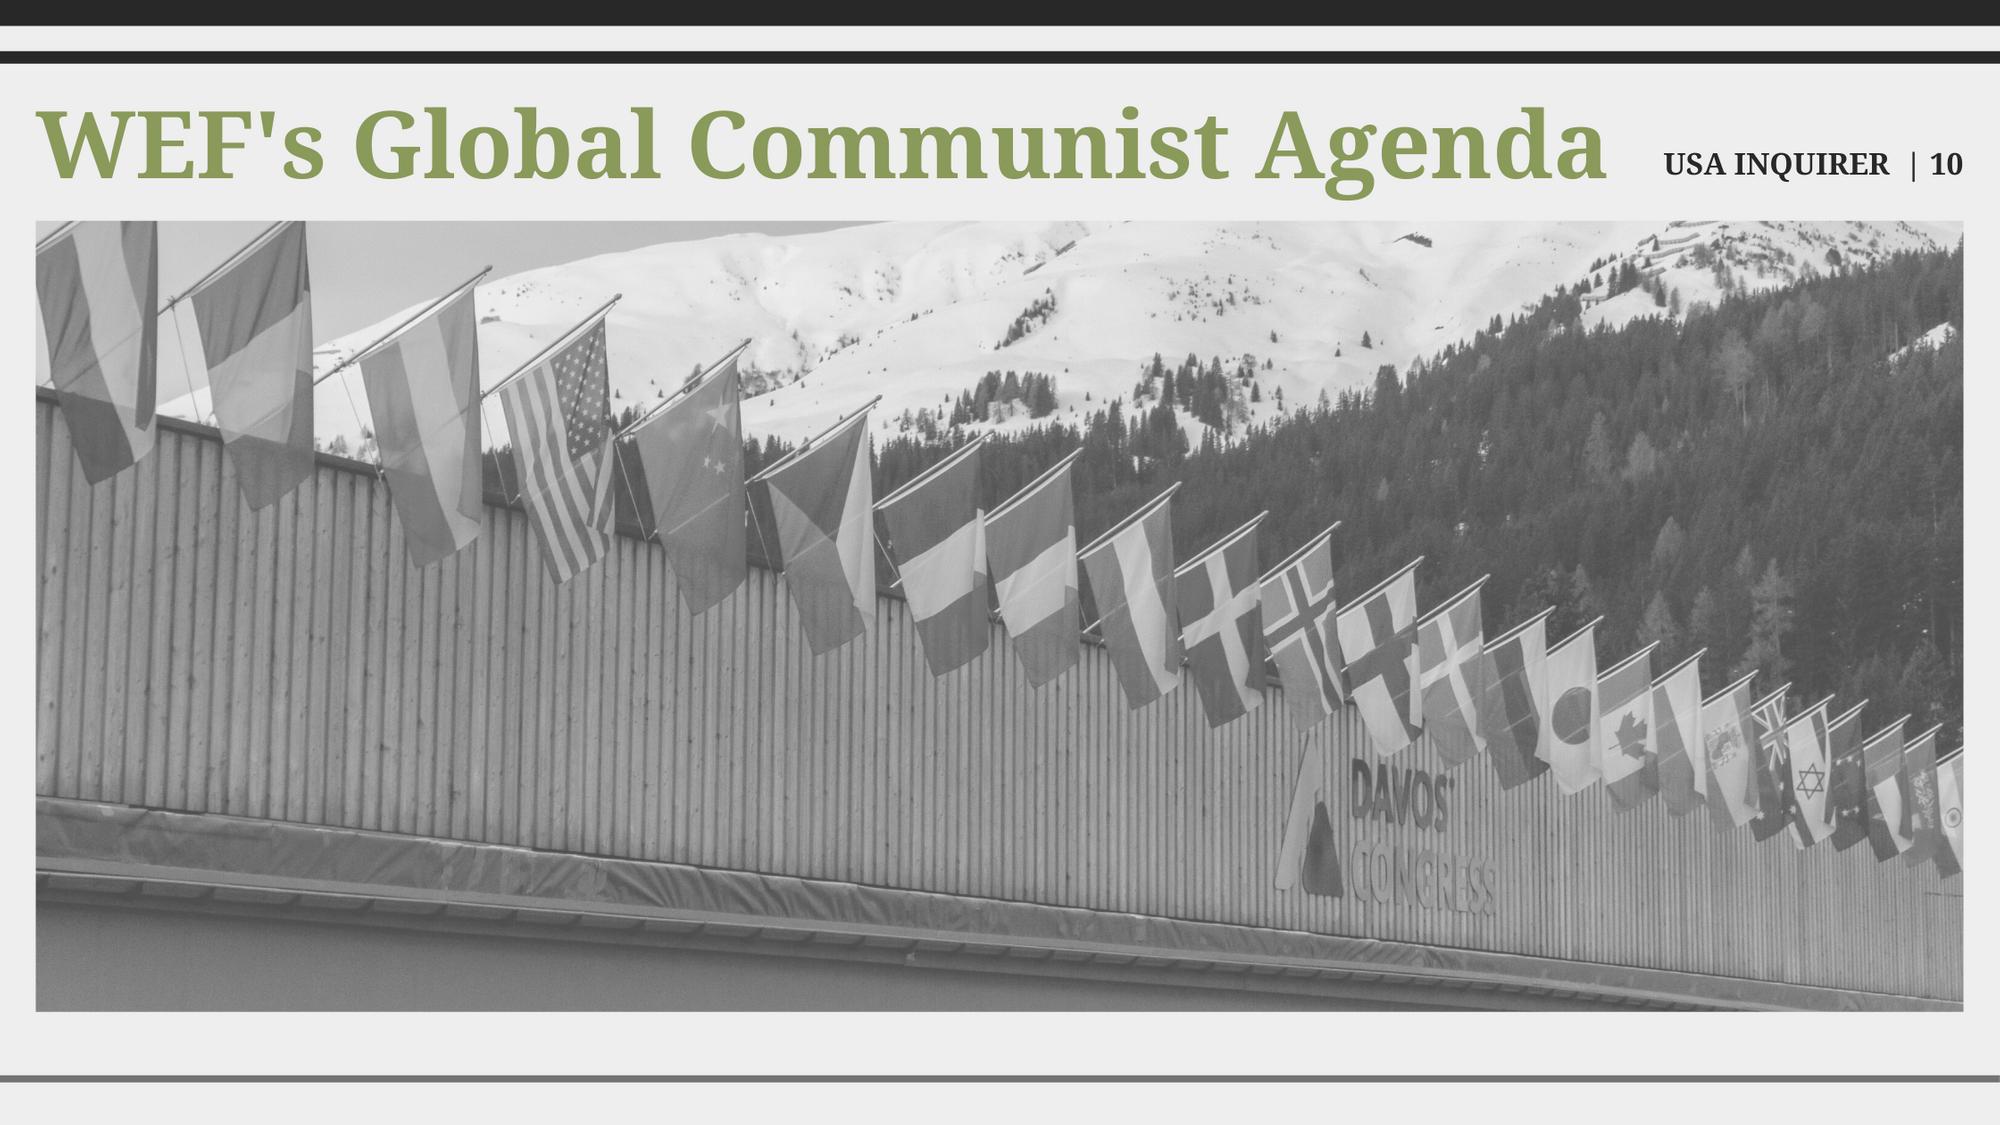 World Economic Forum's Global Communist Agenda